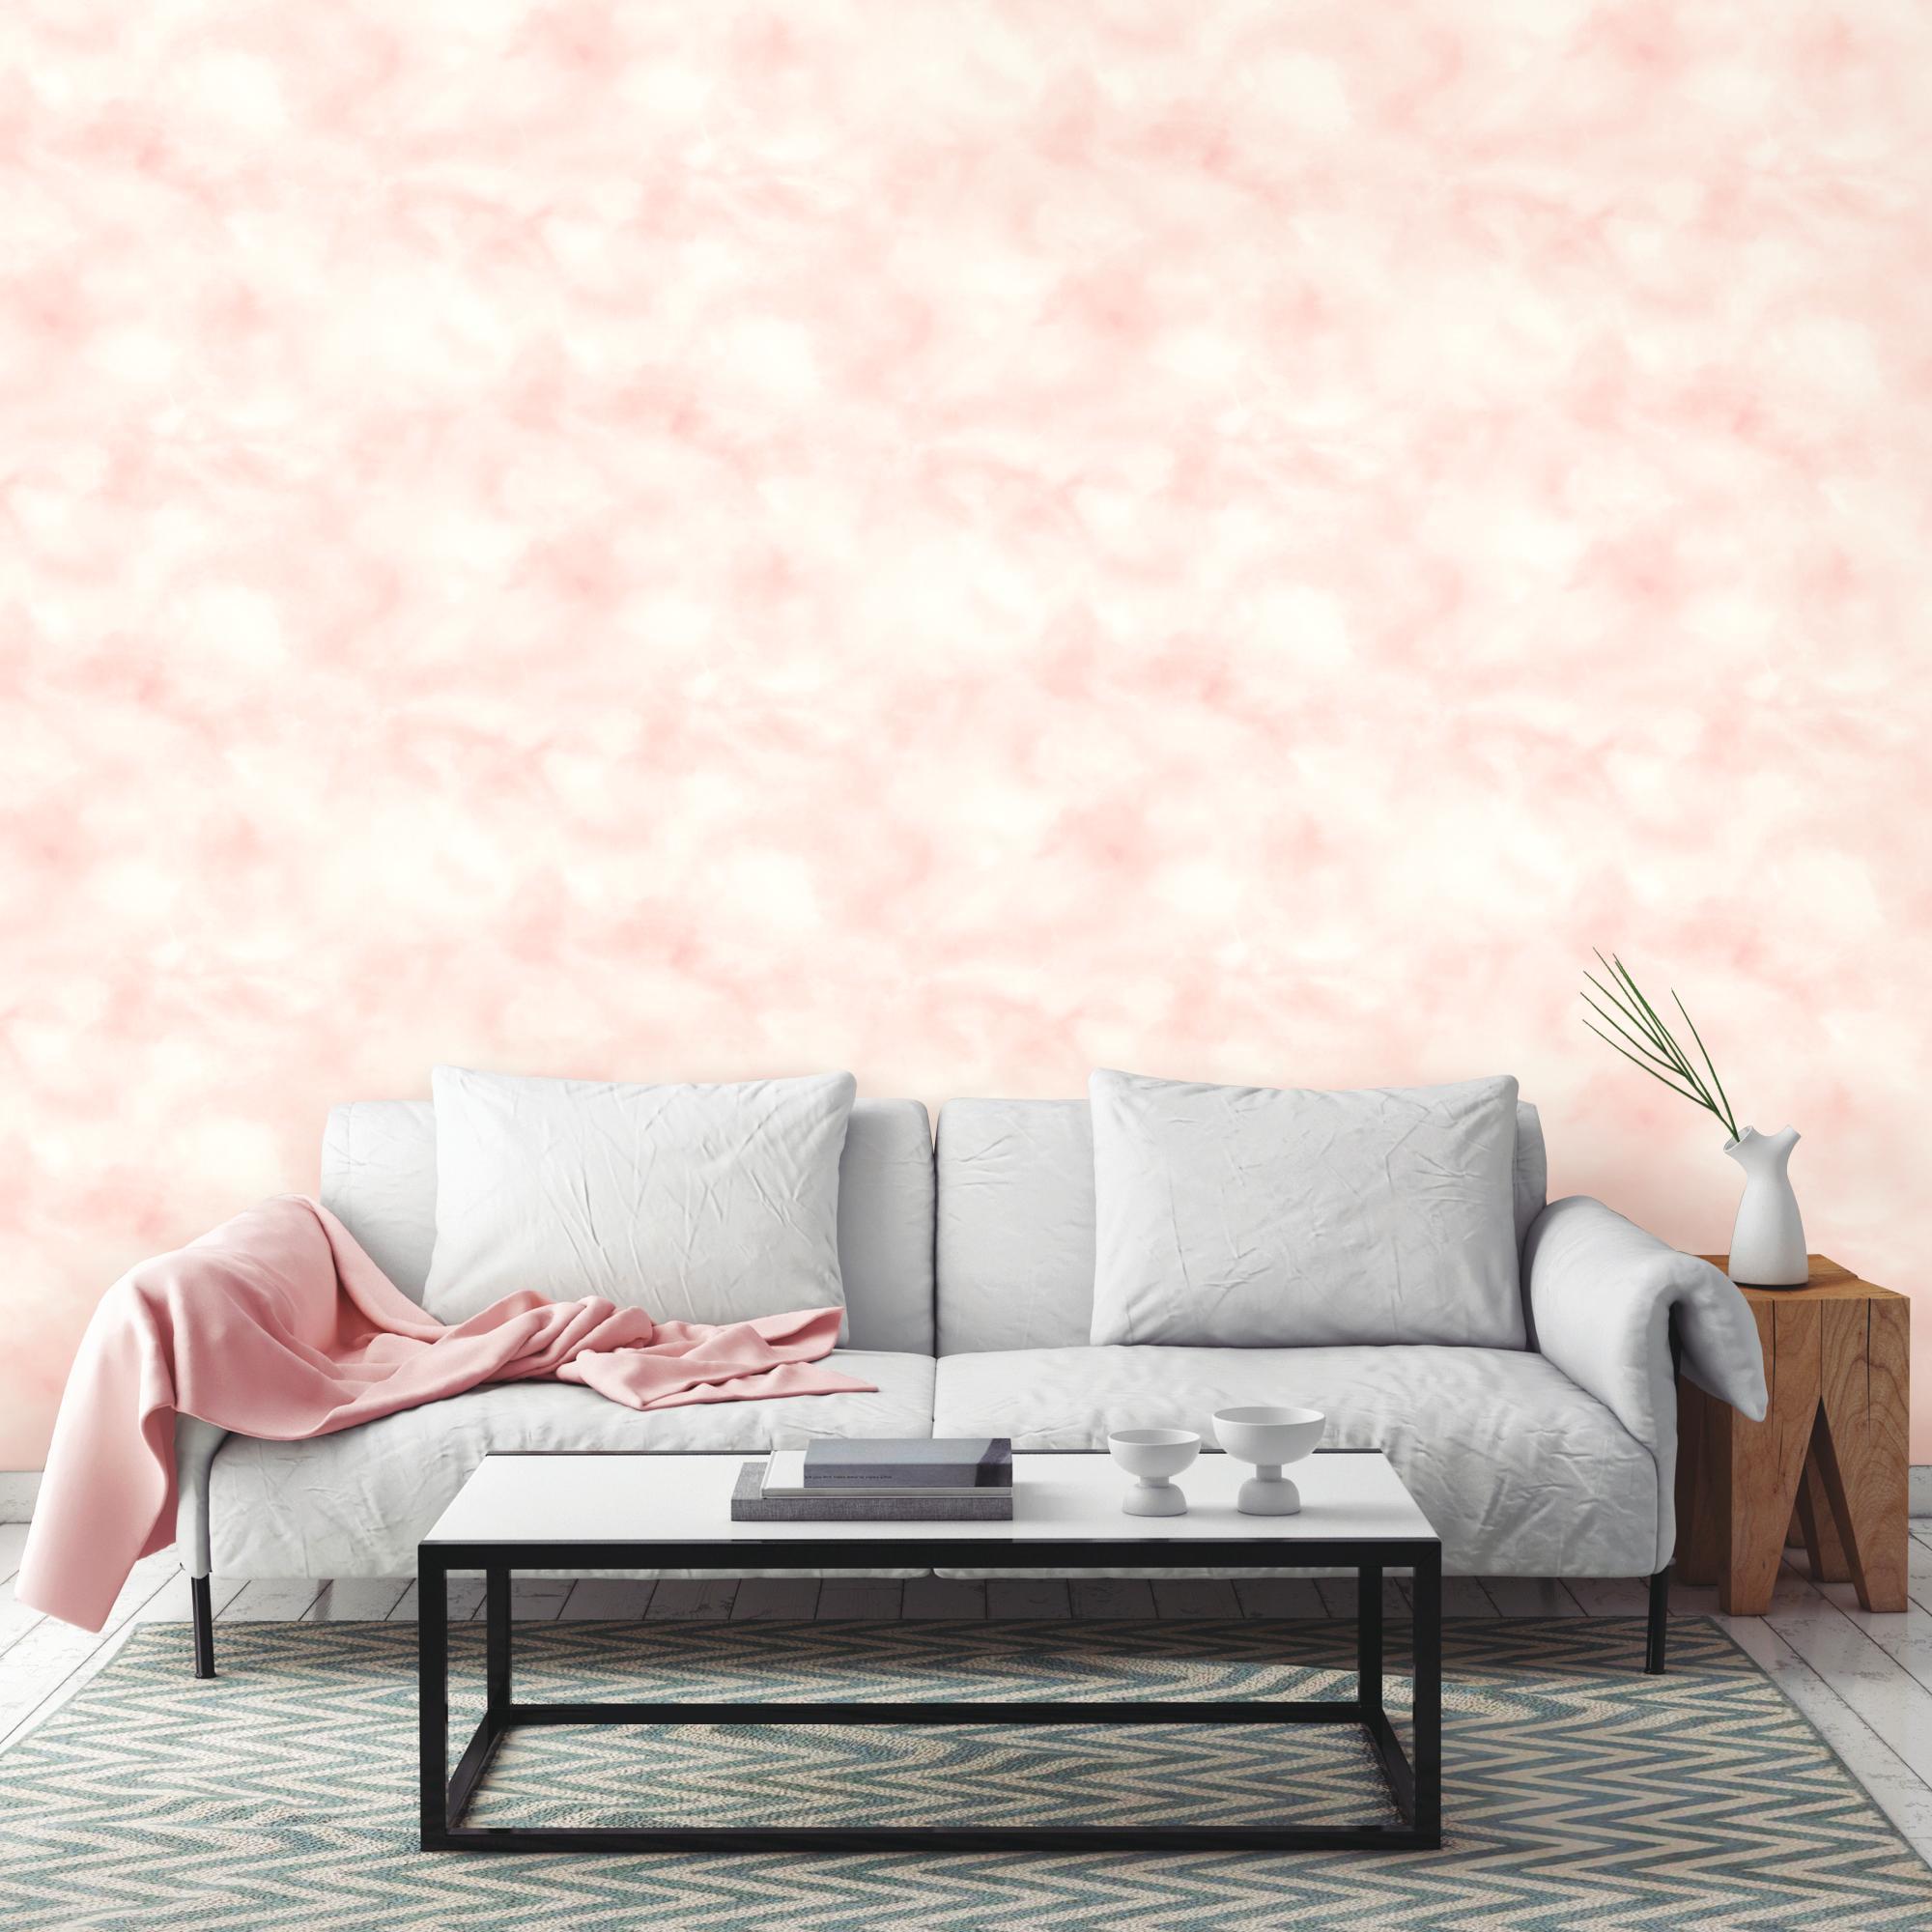 RoomMates Cloud Pink Peel & Stick Wallpaper